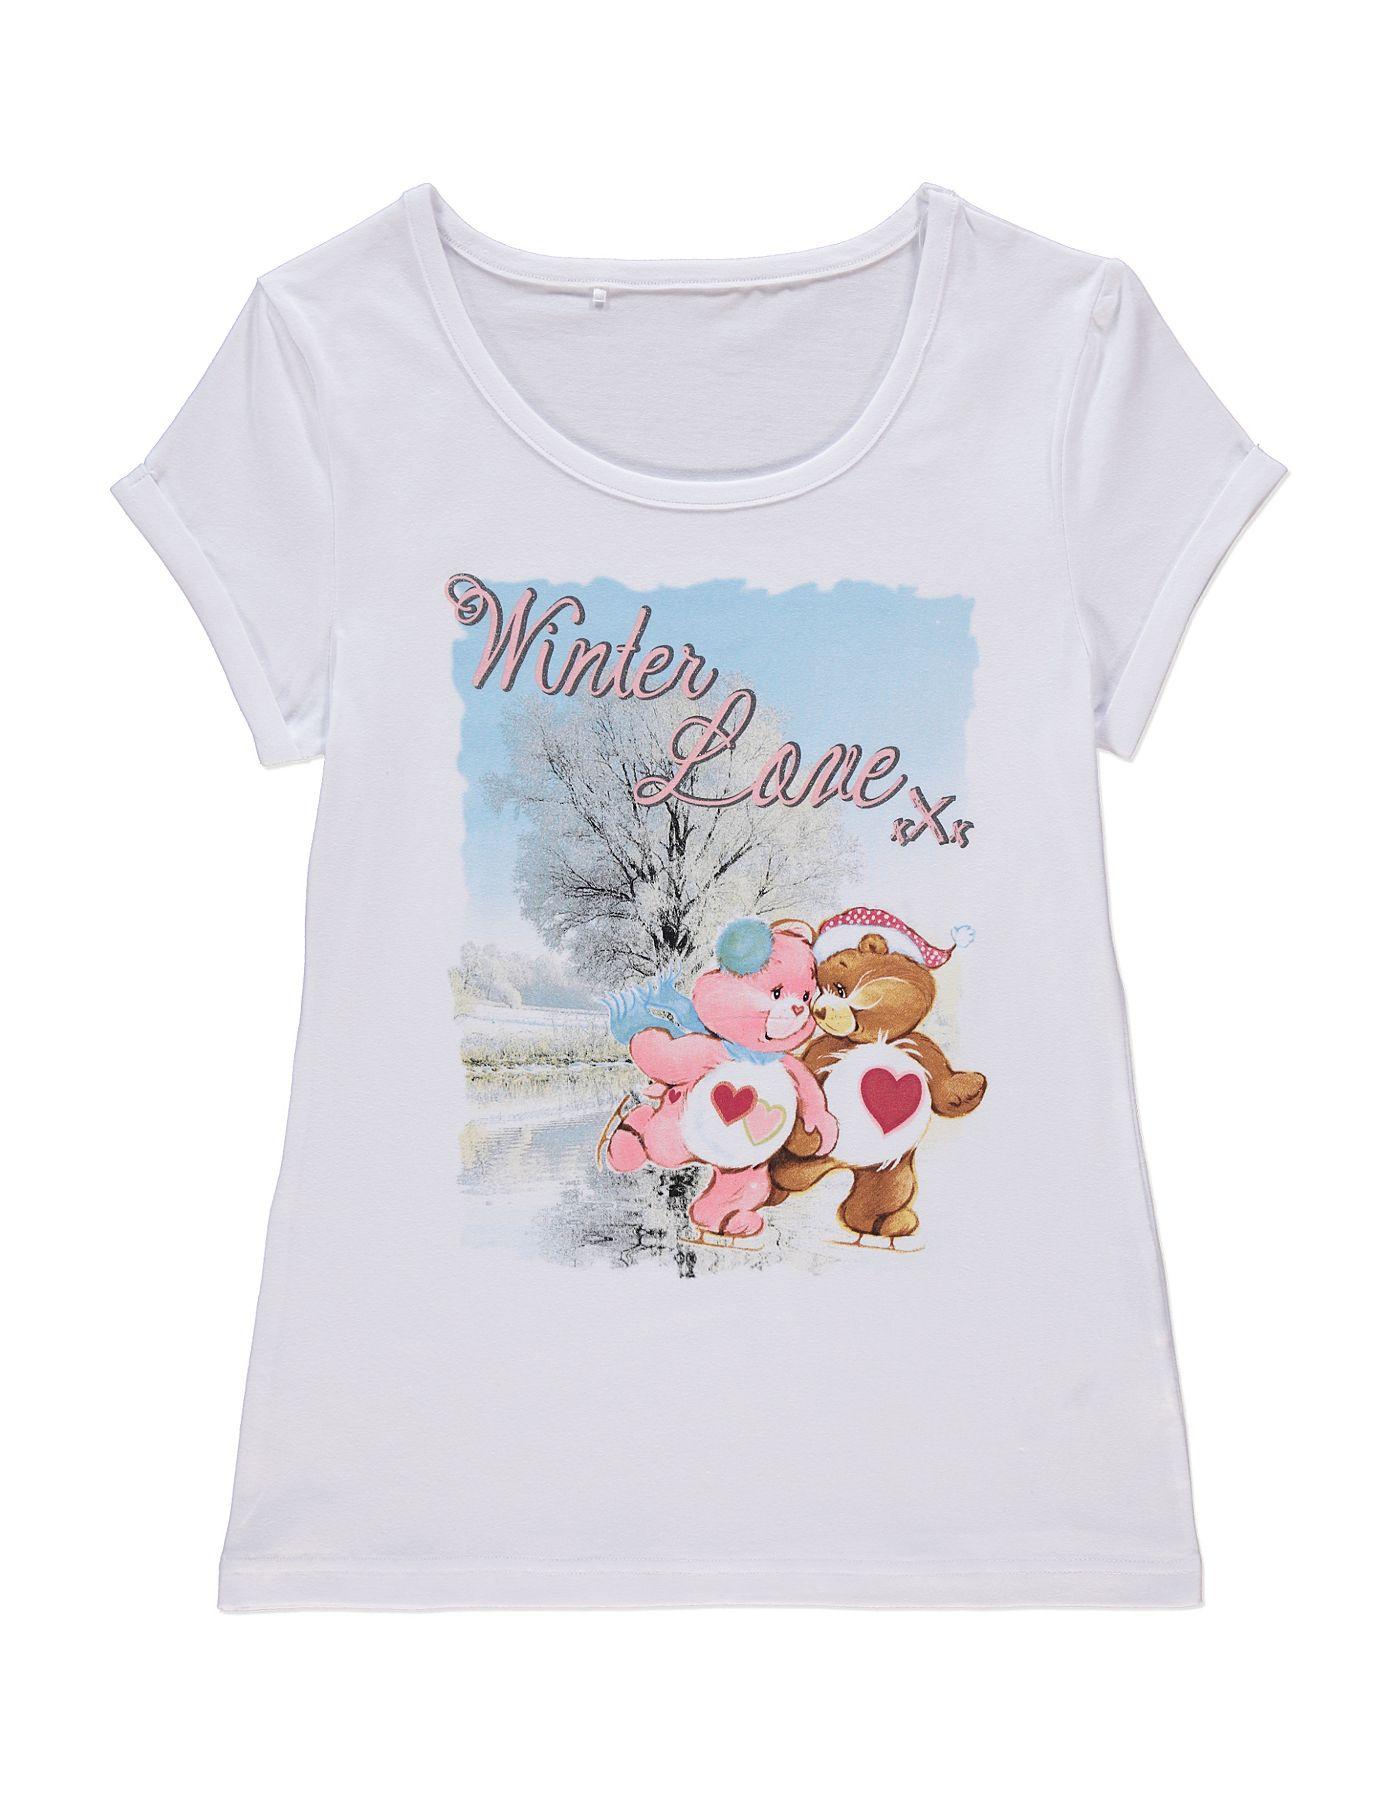 Care Bears Pyjama T-shirt | Women | George at ASDA ...